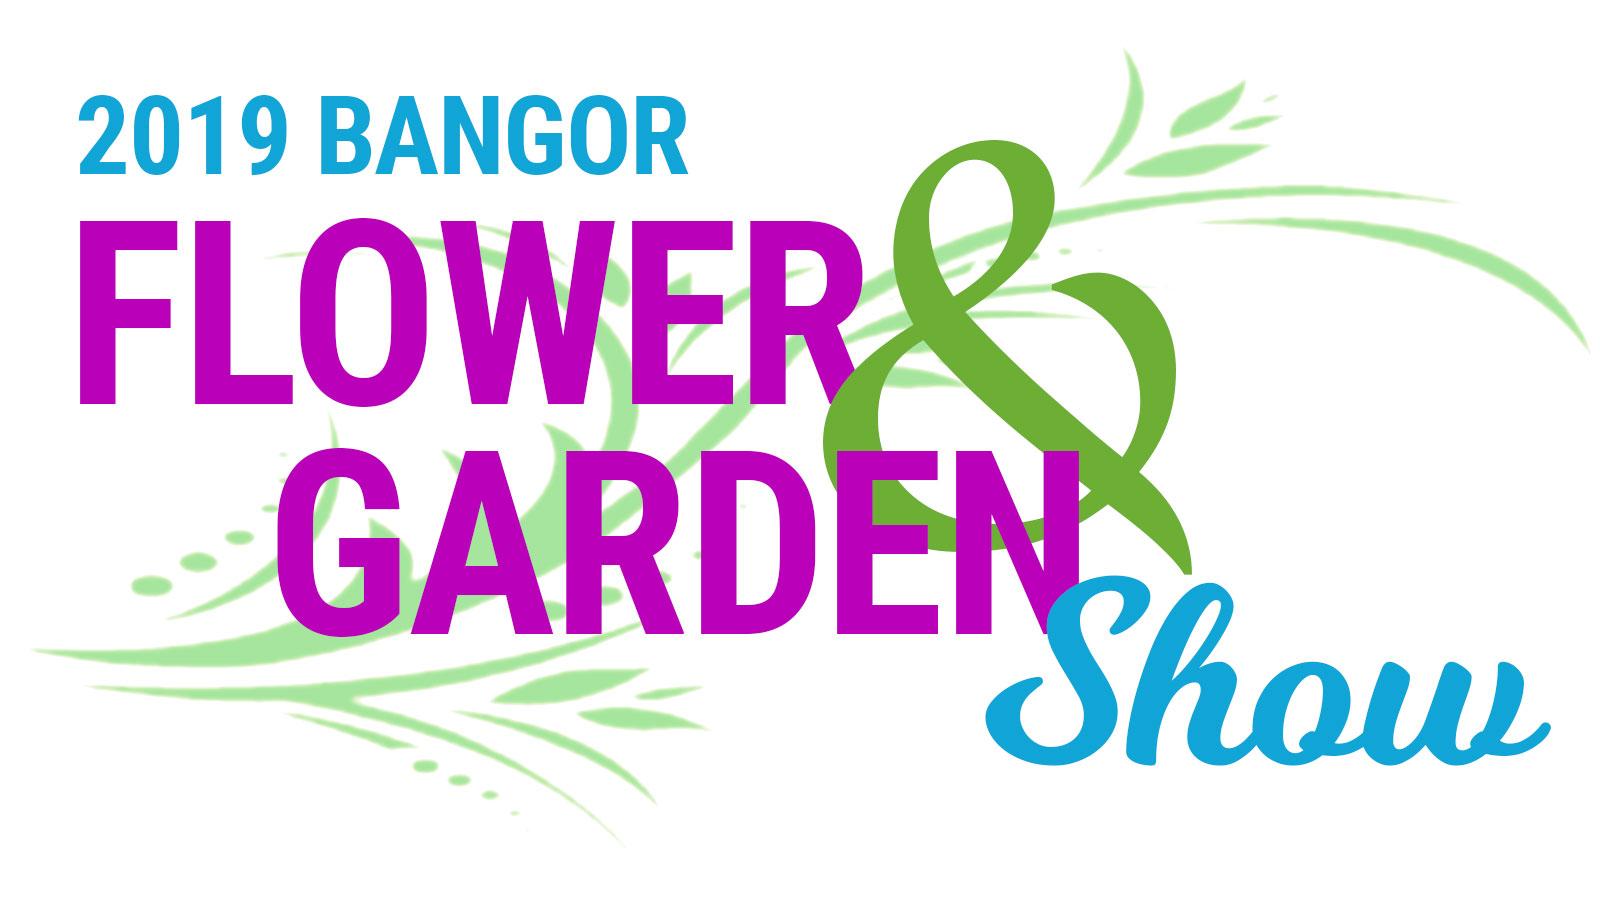 2019 bangor flower and garden show logo graphic